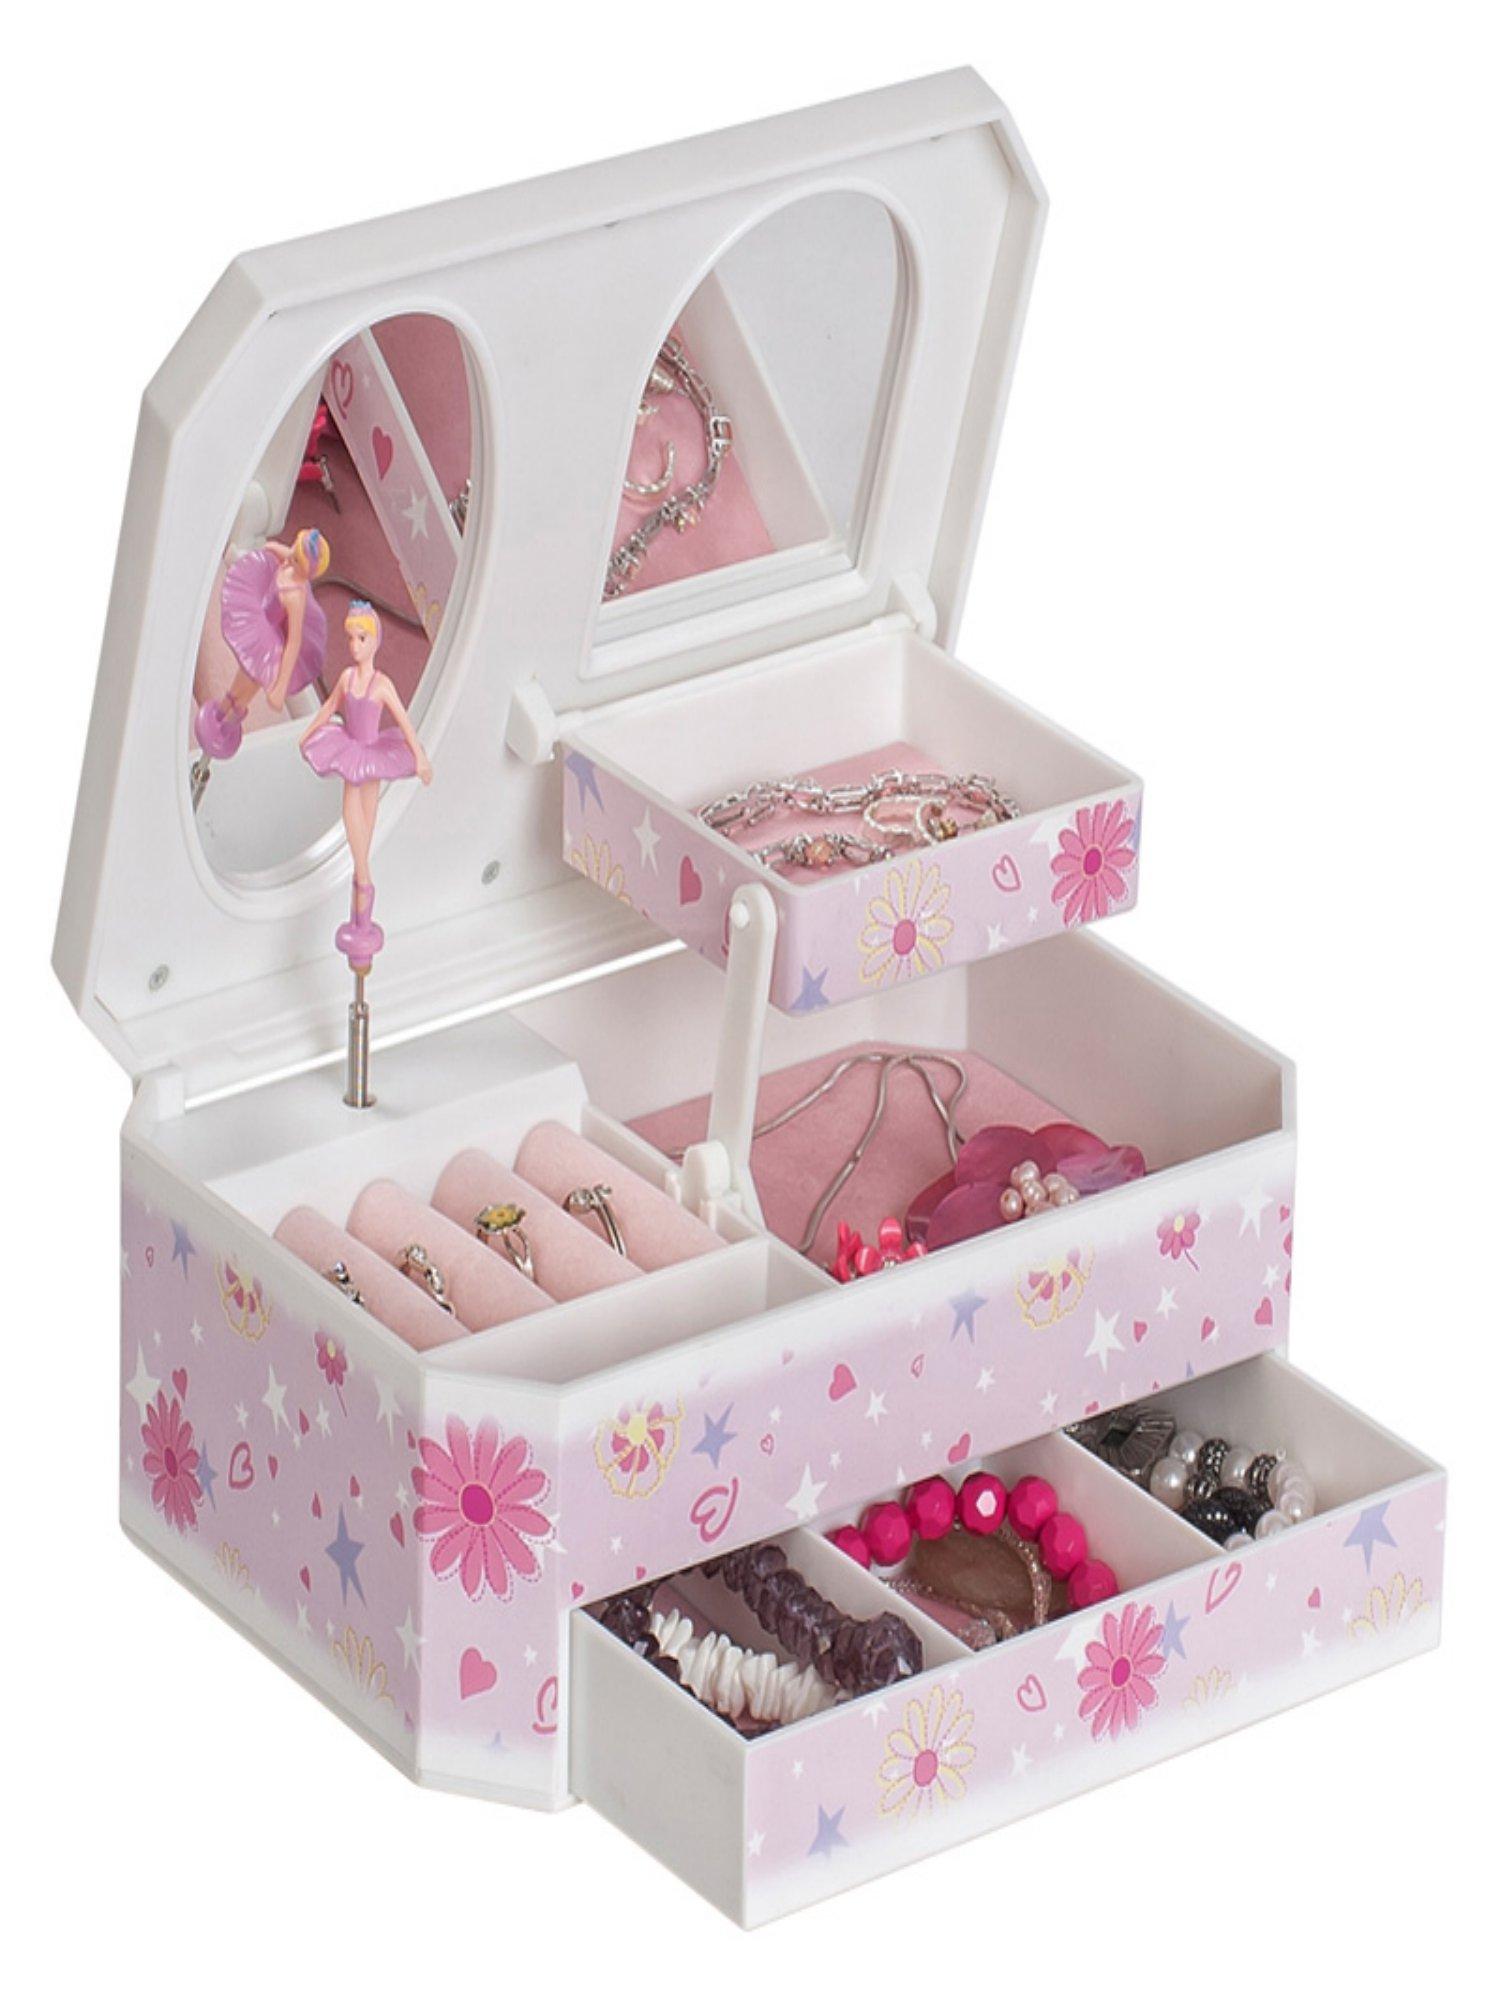 Mele & Co. Hayley Glittery Musical Ballerina Jewelry Box